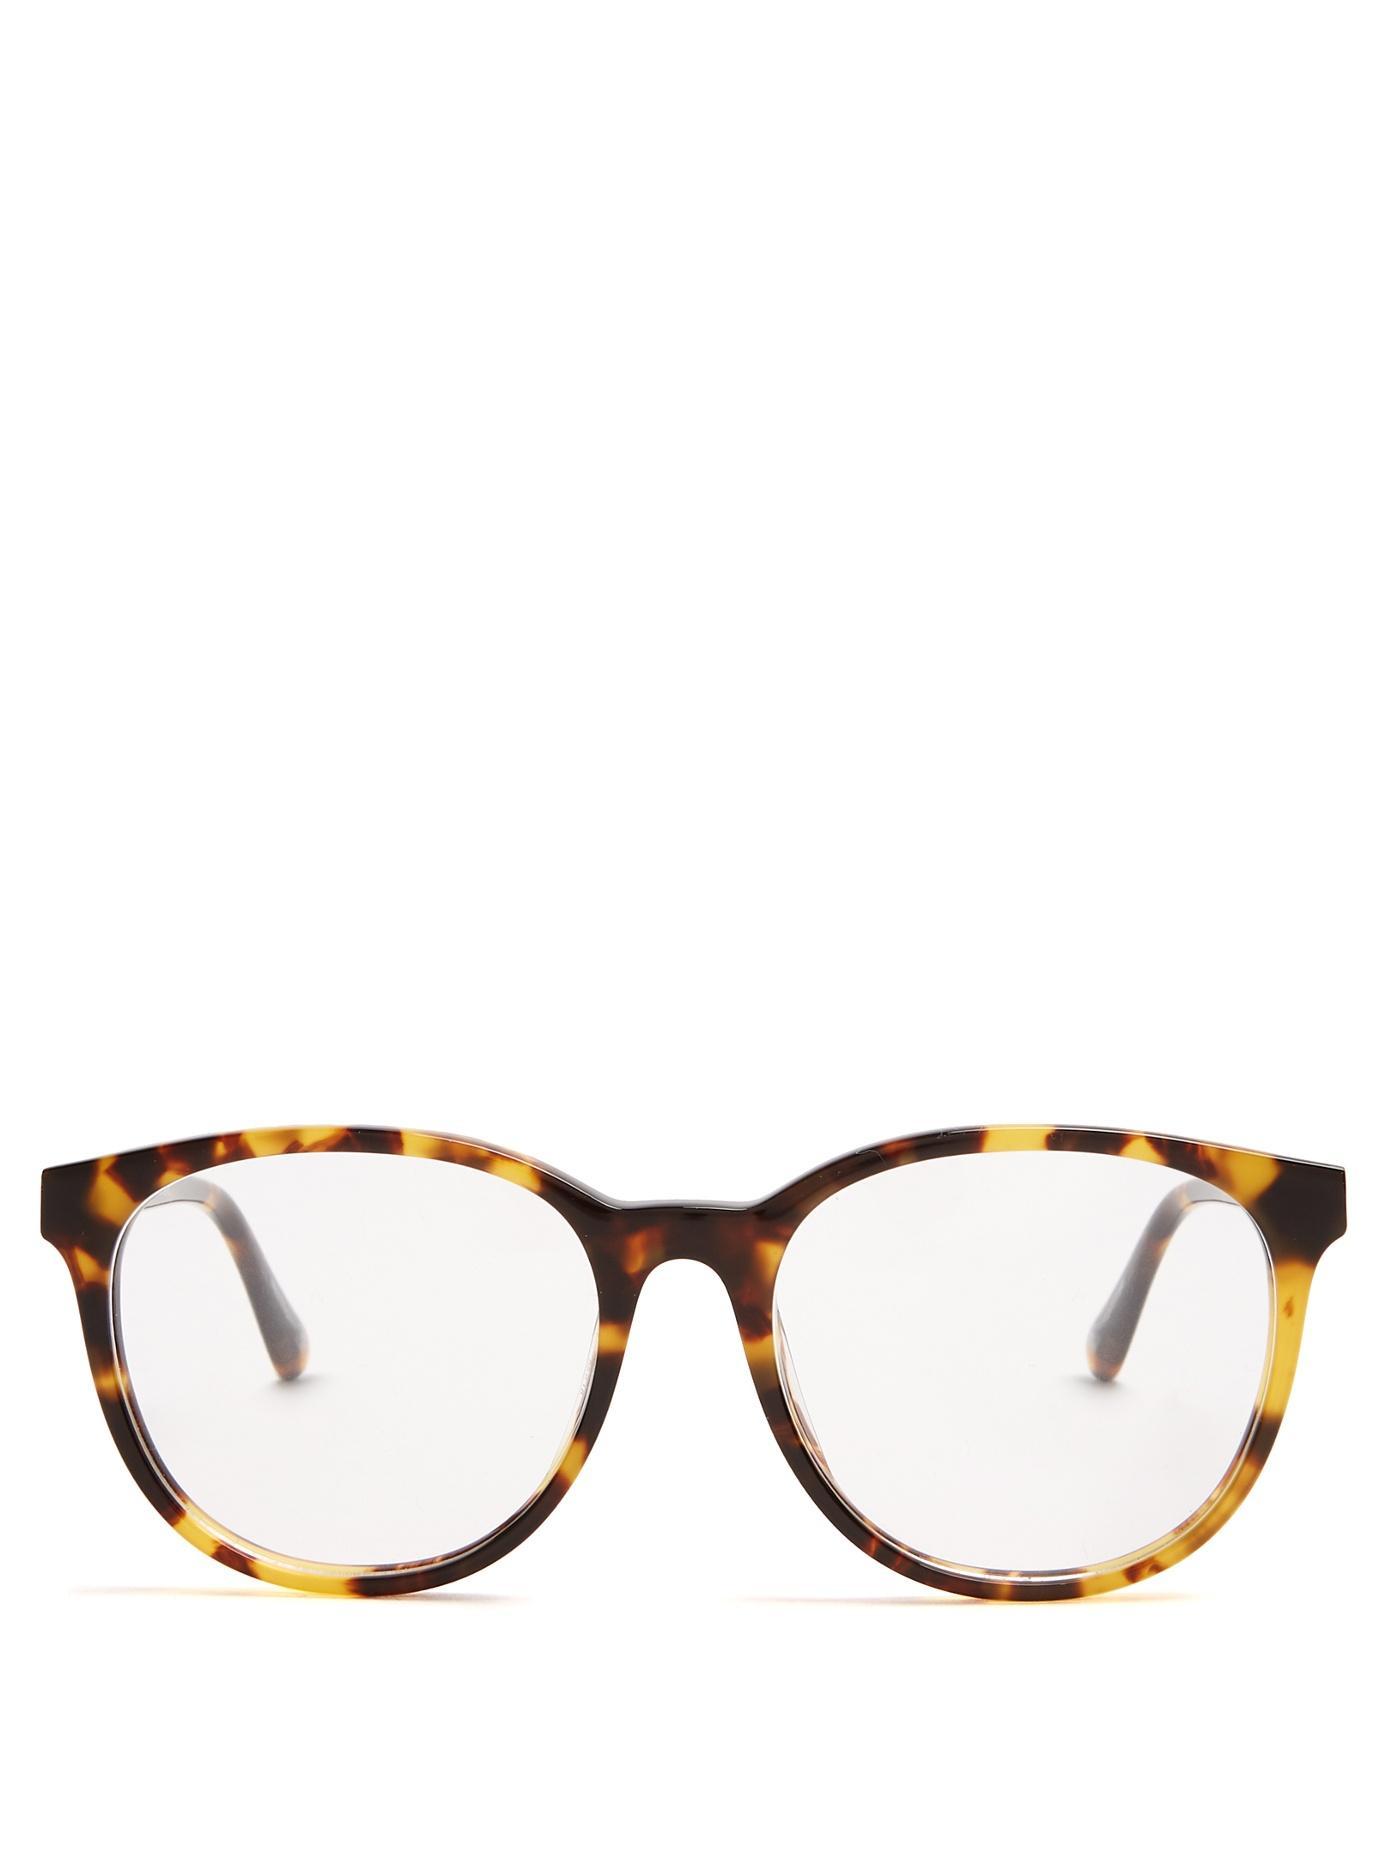 Stella Mccartney - Falabella Round Frame Acetate Glasses - Womens - Tortoiseshell